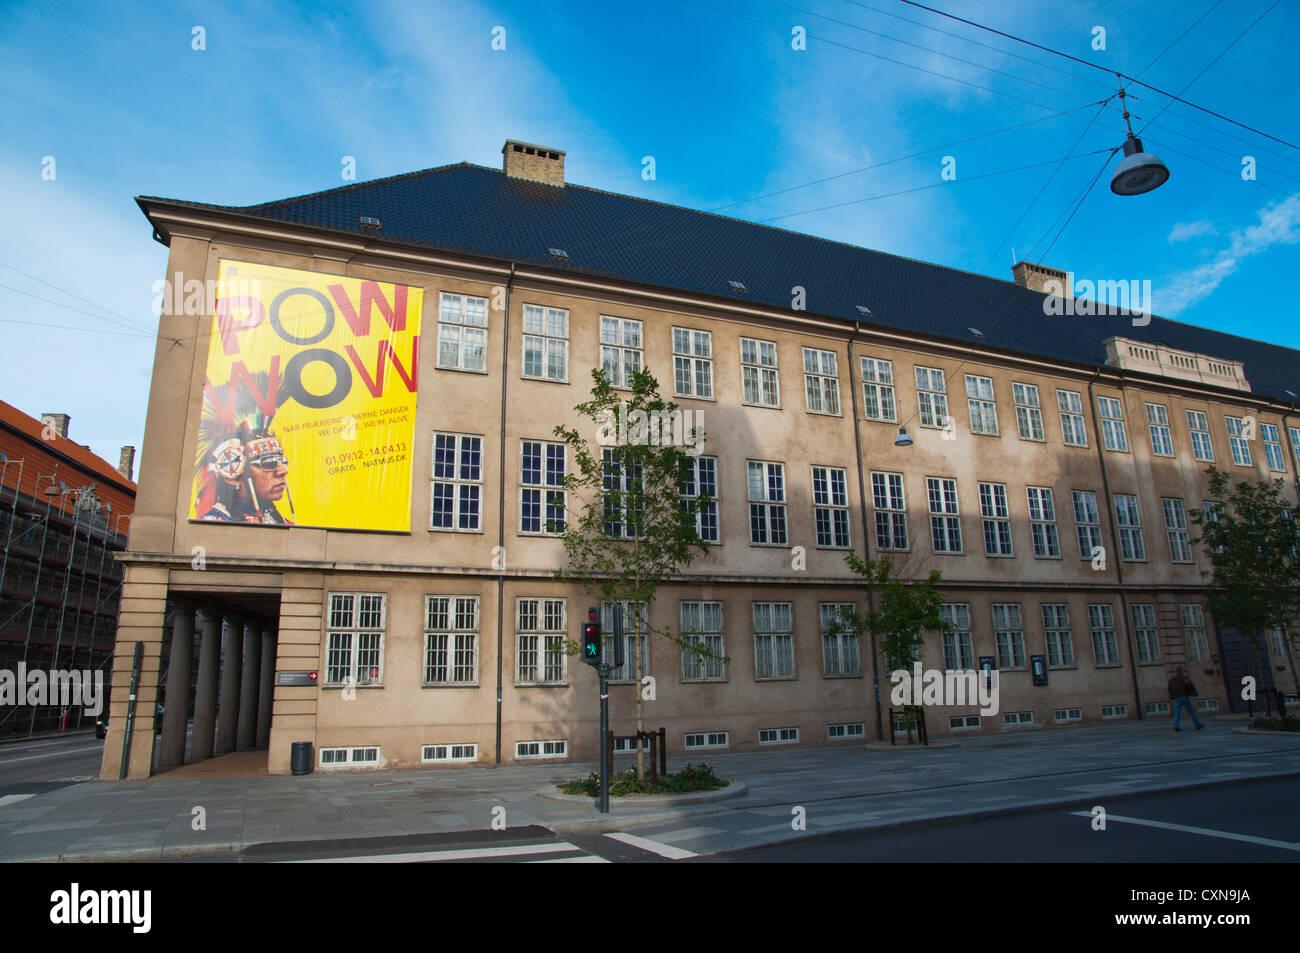 Nationalmuseet el Museo Nacional de historia cultural exterior Copenhague Dinamarca Europa central Foto de stock